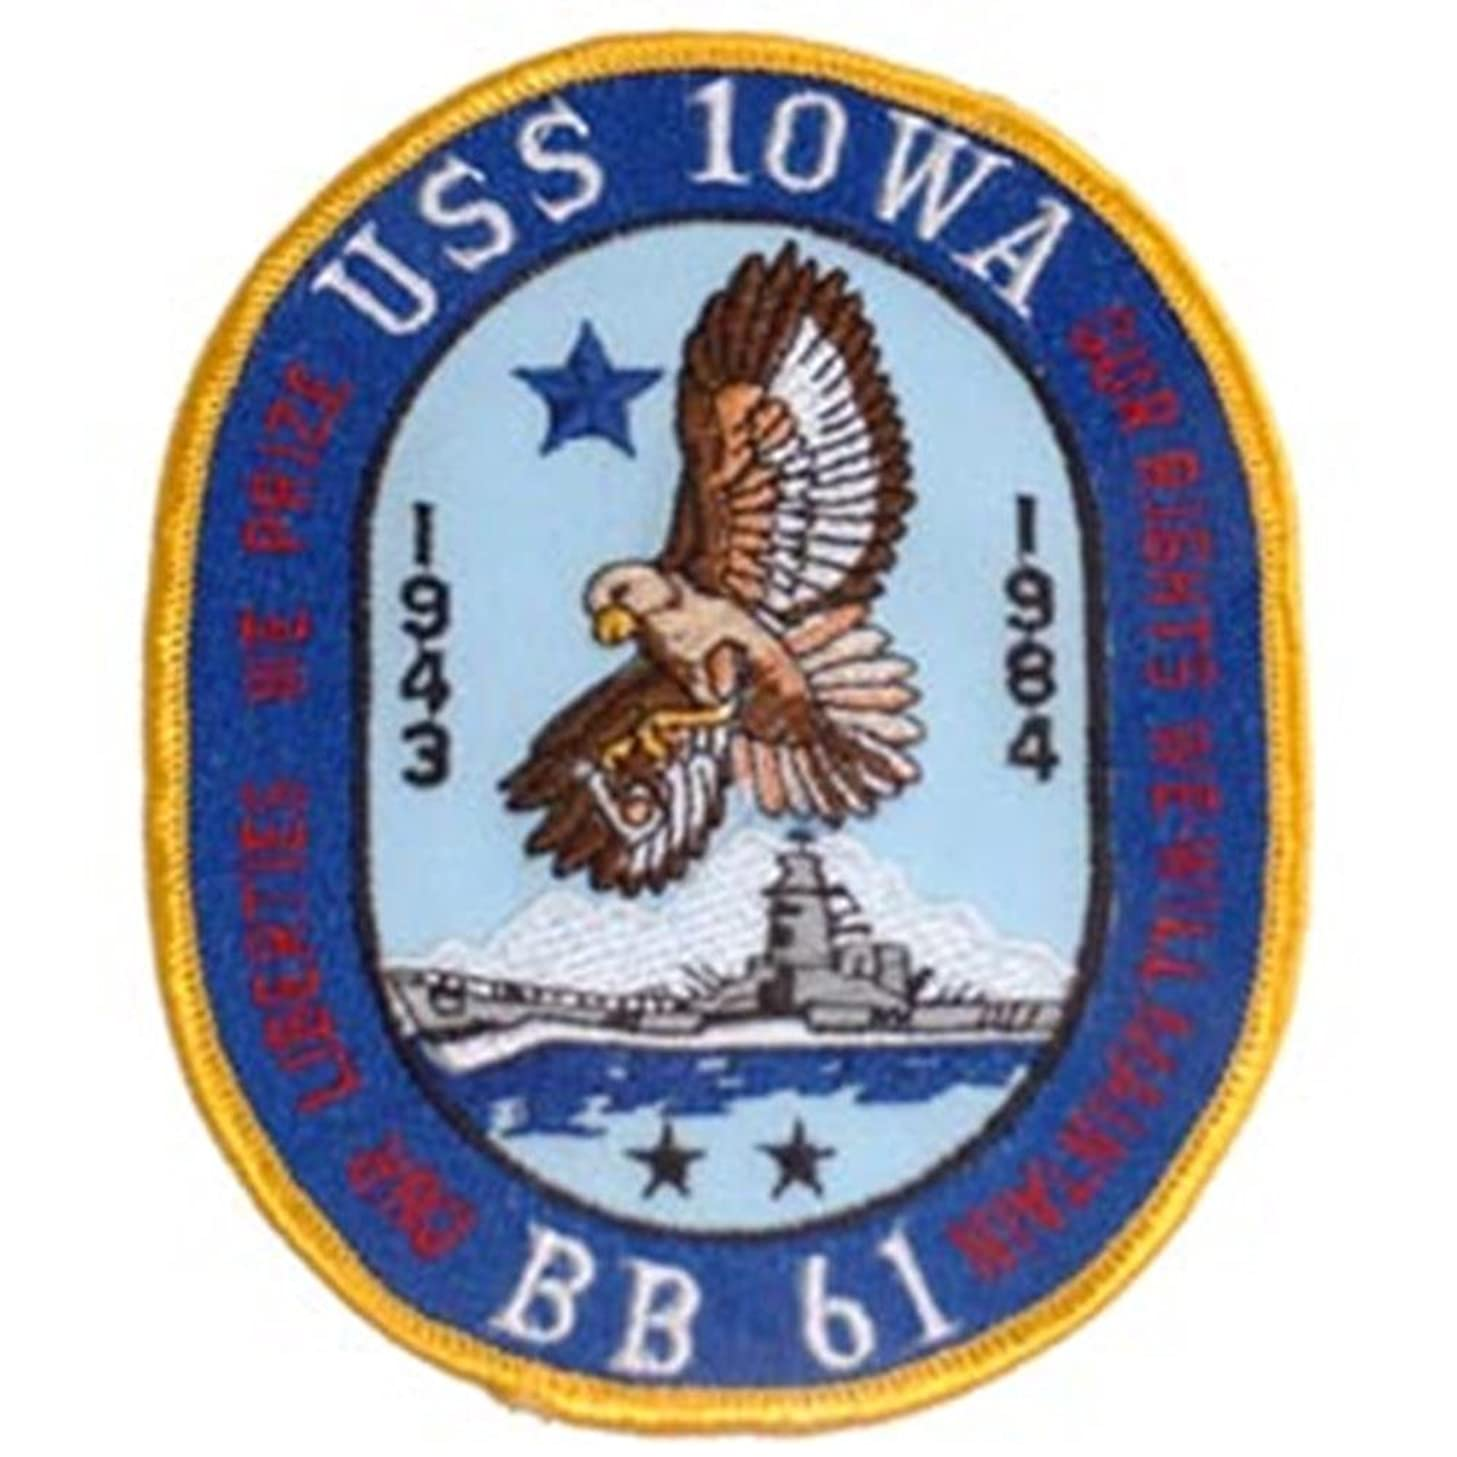 EagleEmblems PM5259 Patch-Uss,Iowa,BB-61 (3.5'')